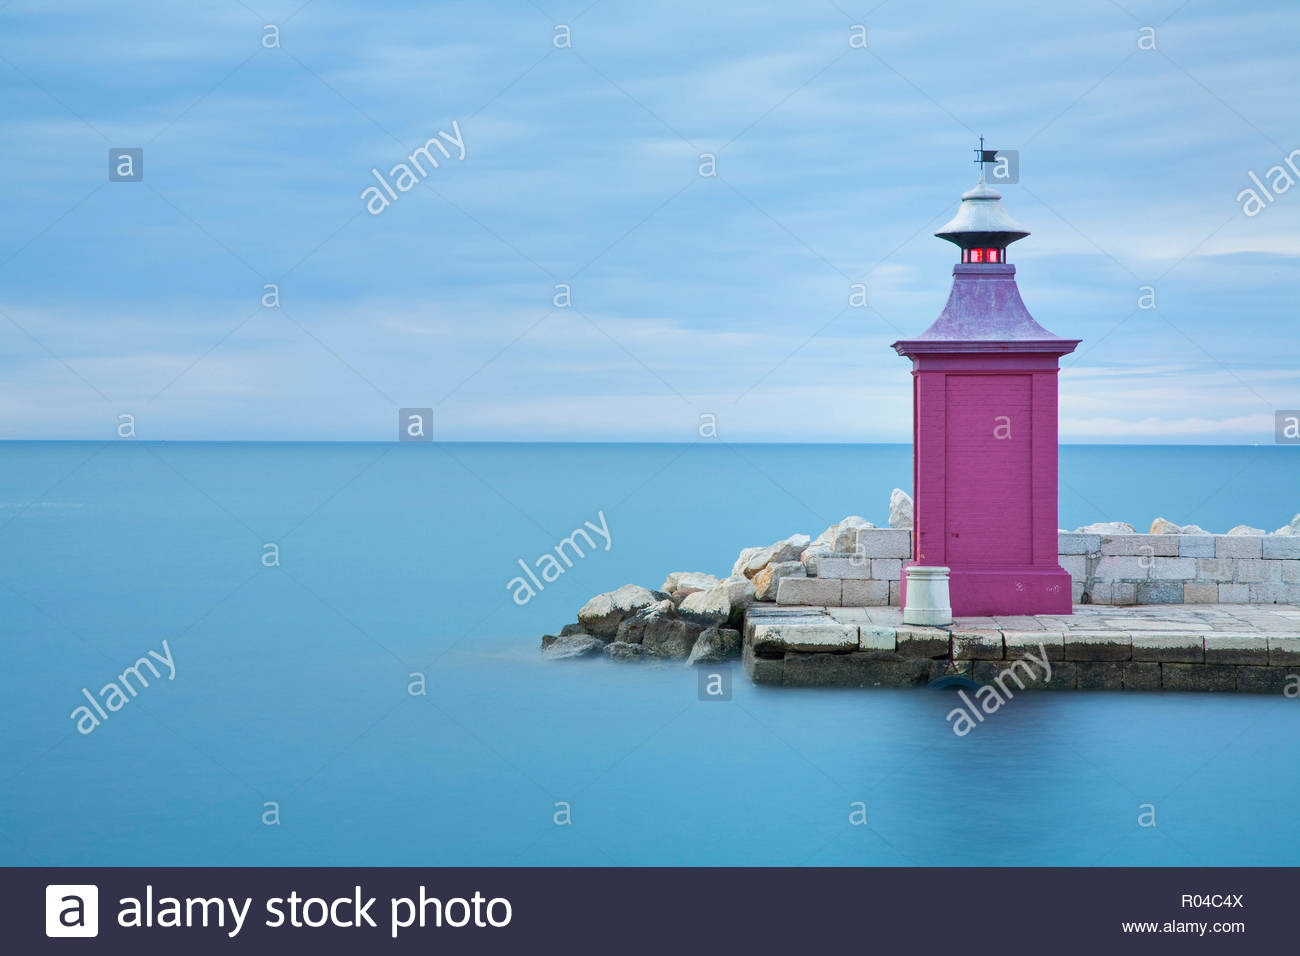 Beacon at entrance to Piran Harbour, Adriatic Coast, Slovenia - Stock Image